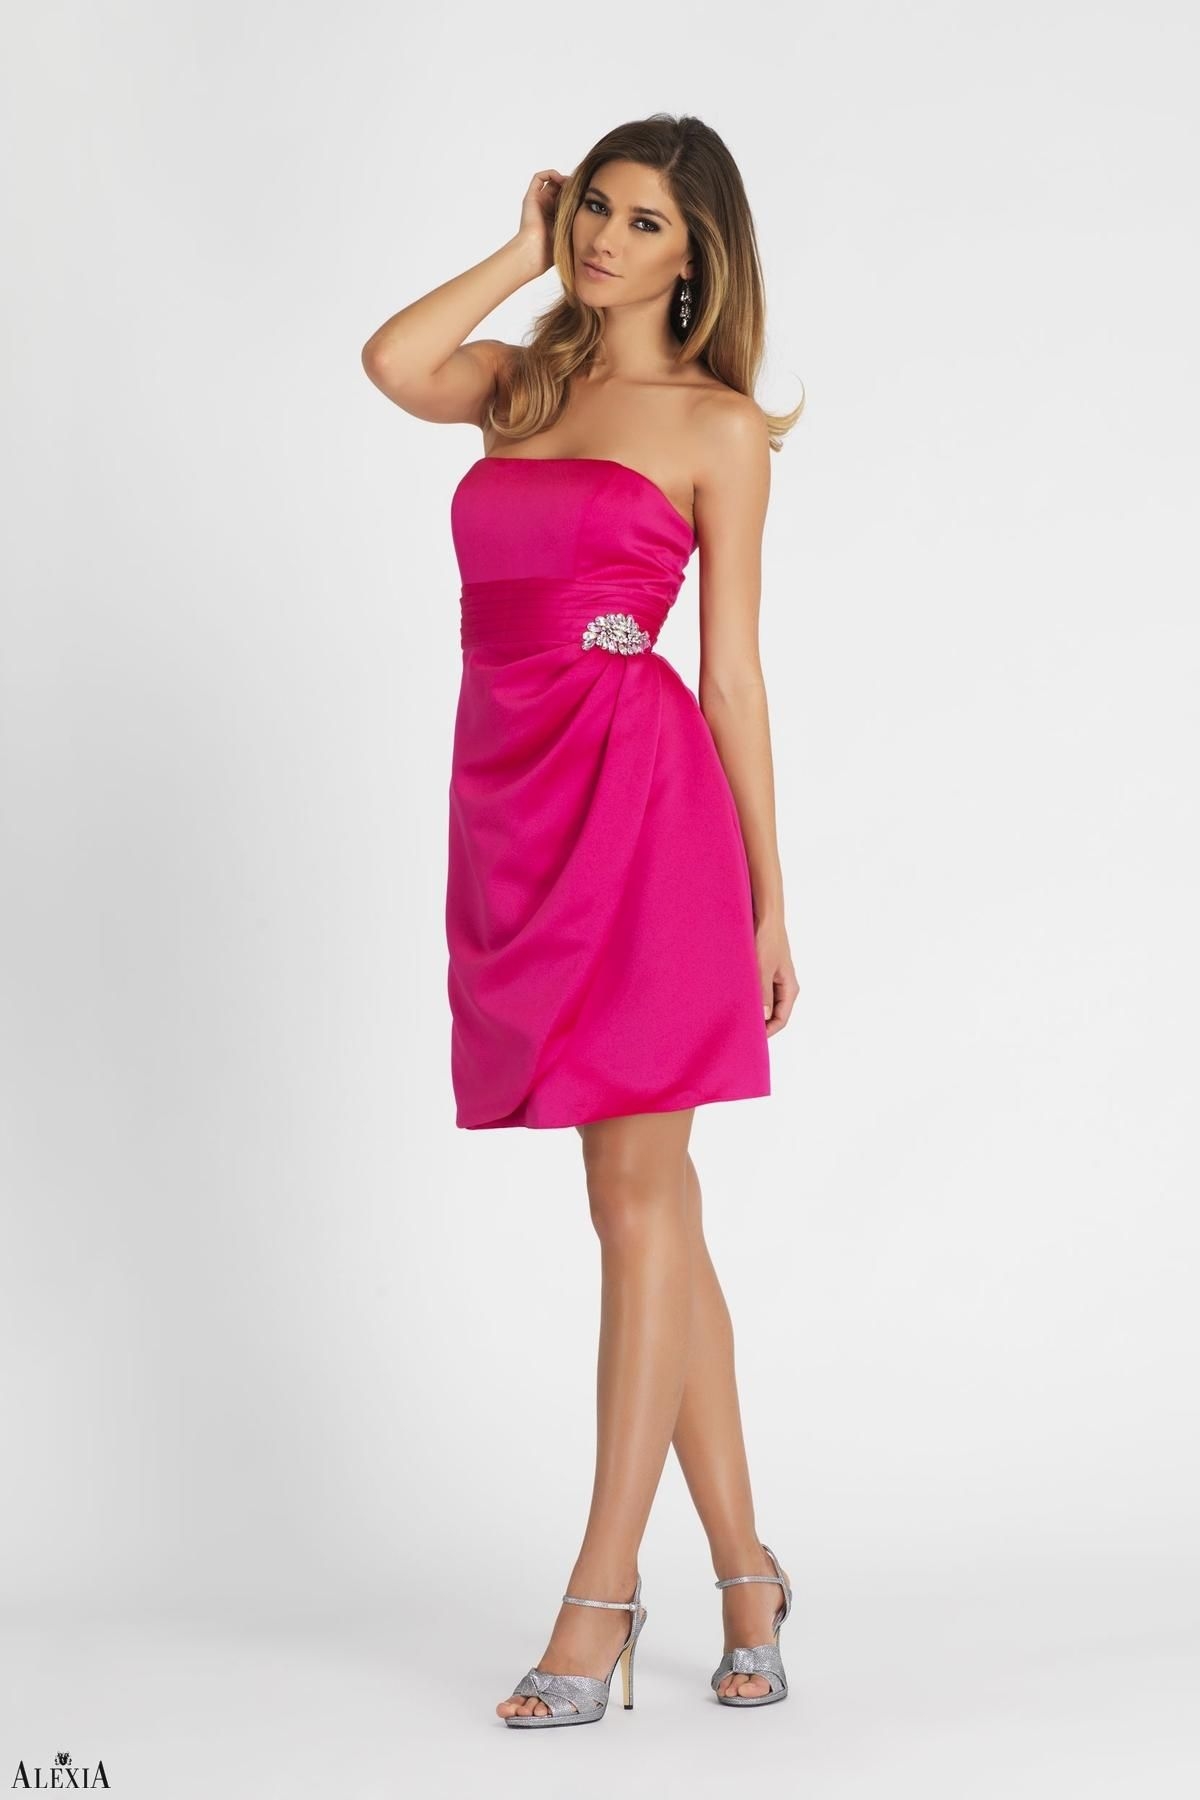 Magenta satin strapless, cocktail length dress. Pleated waistband ...